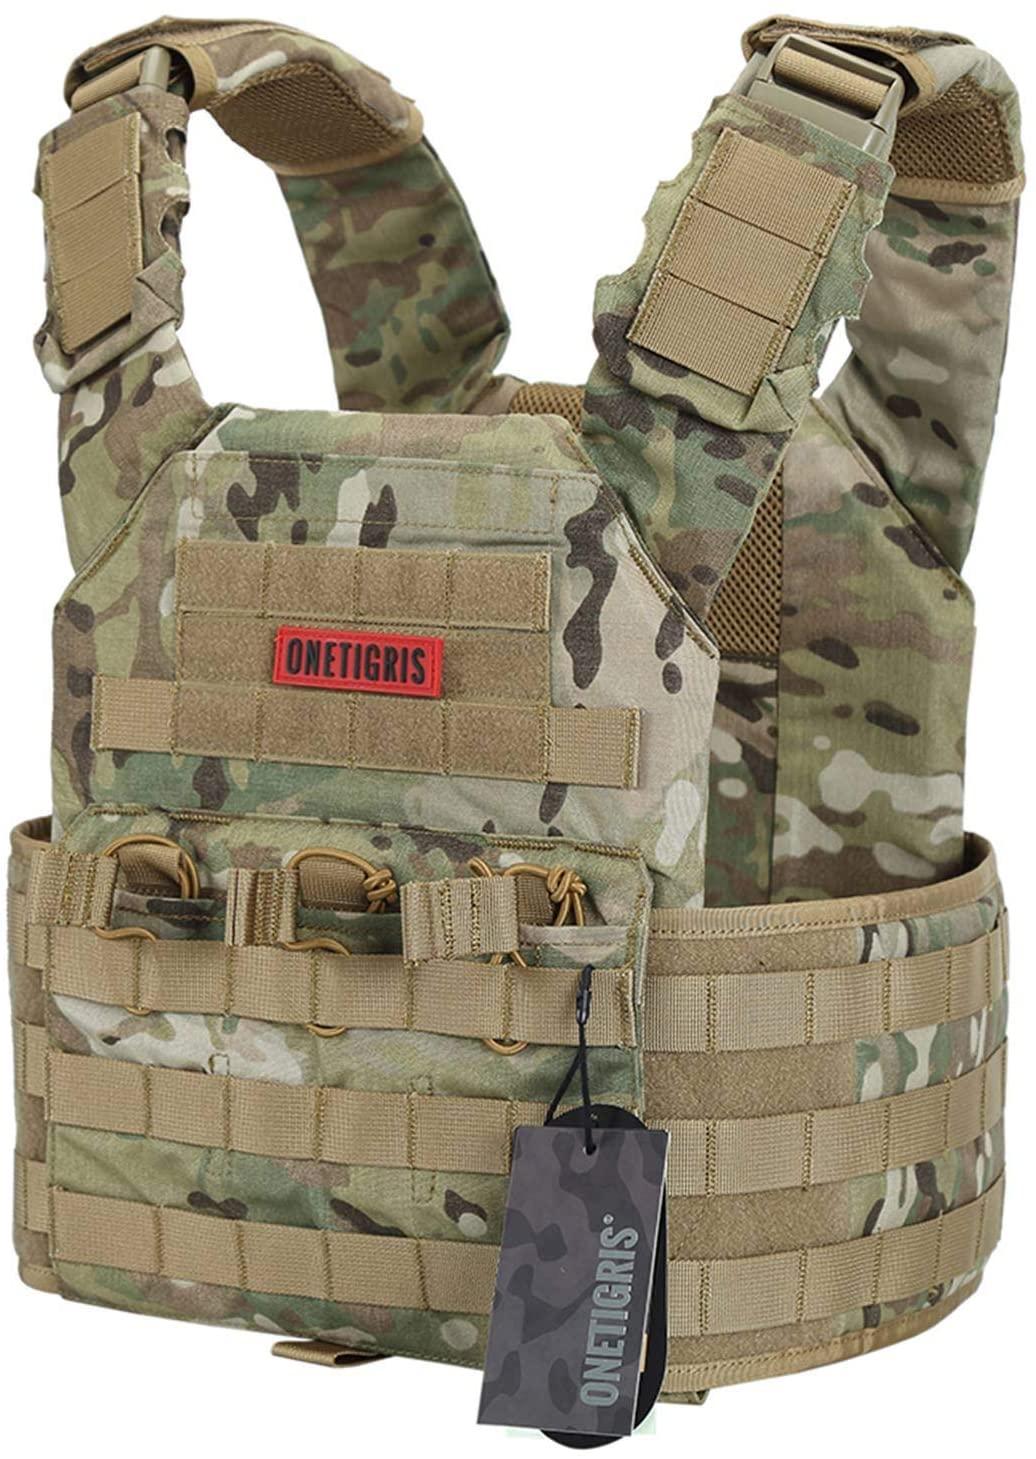 1-OneTigris Doom tactical vest